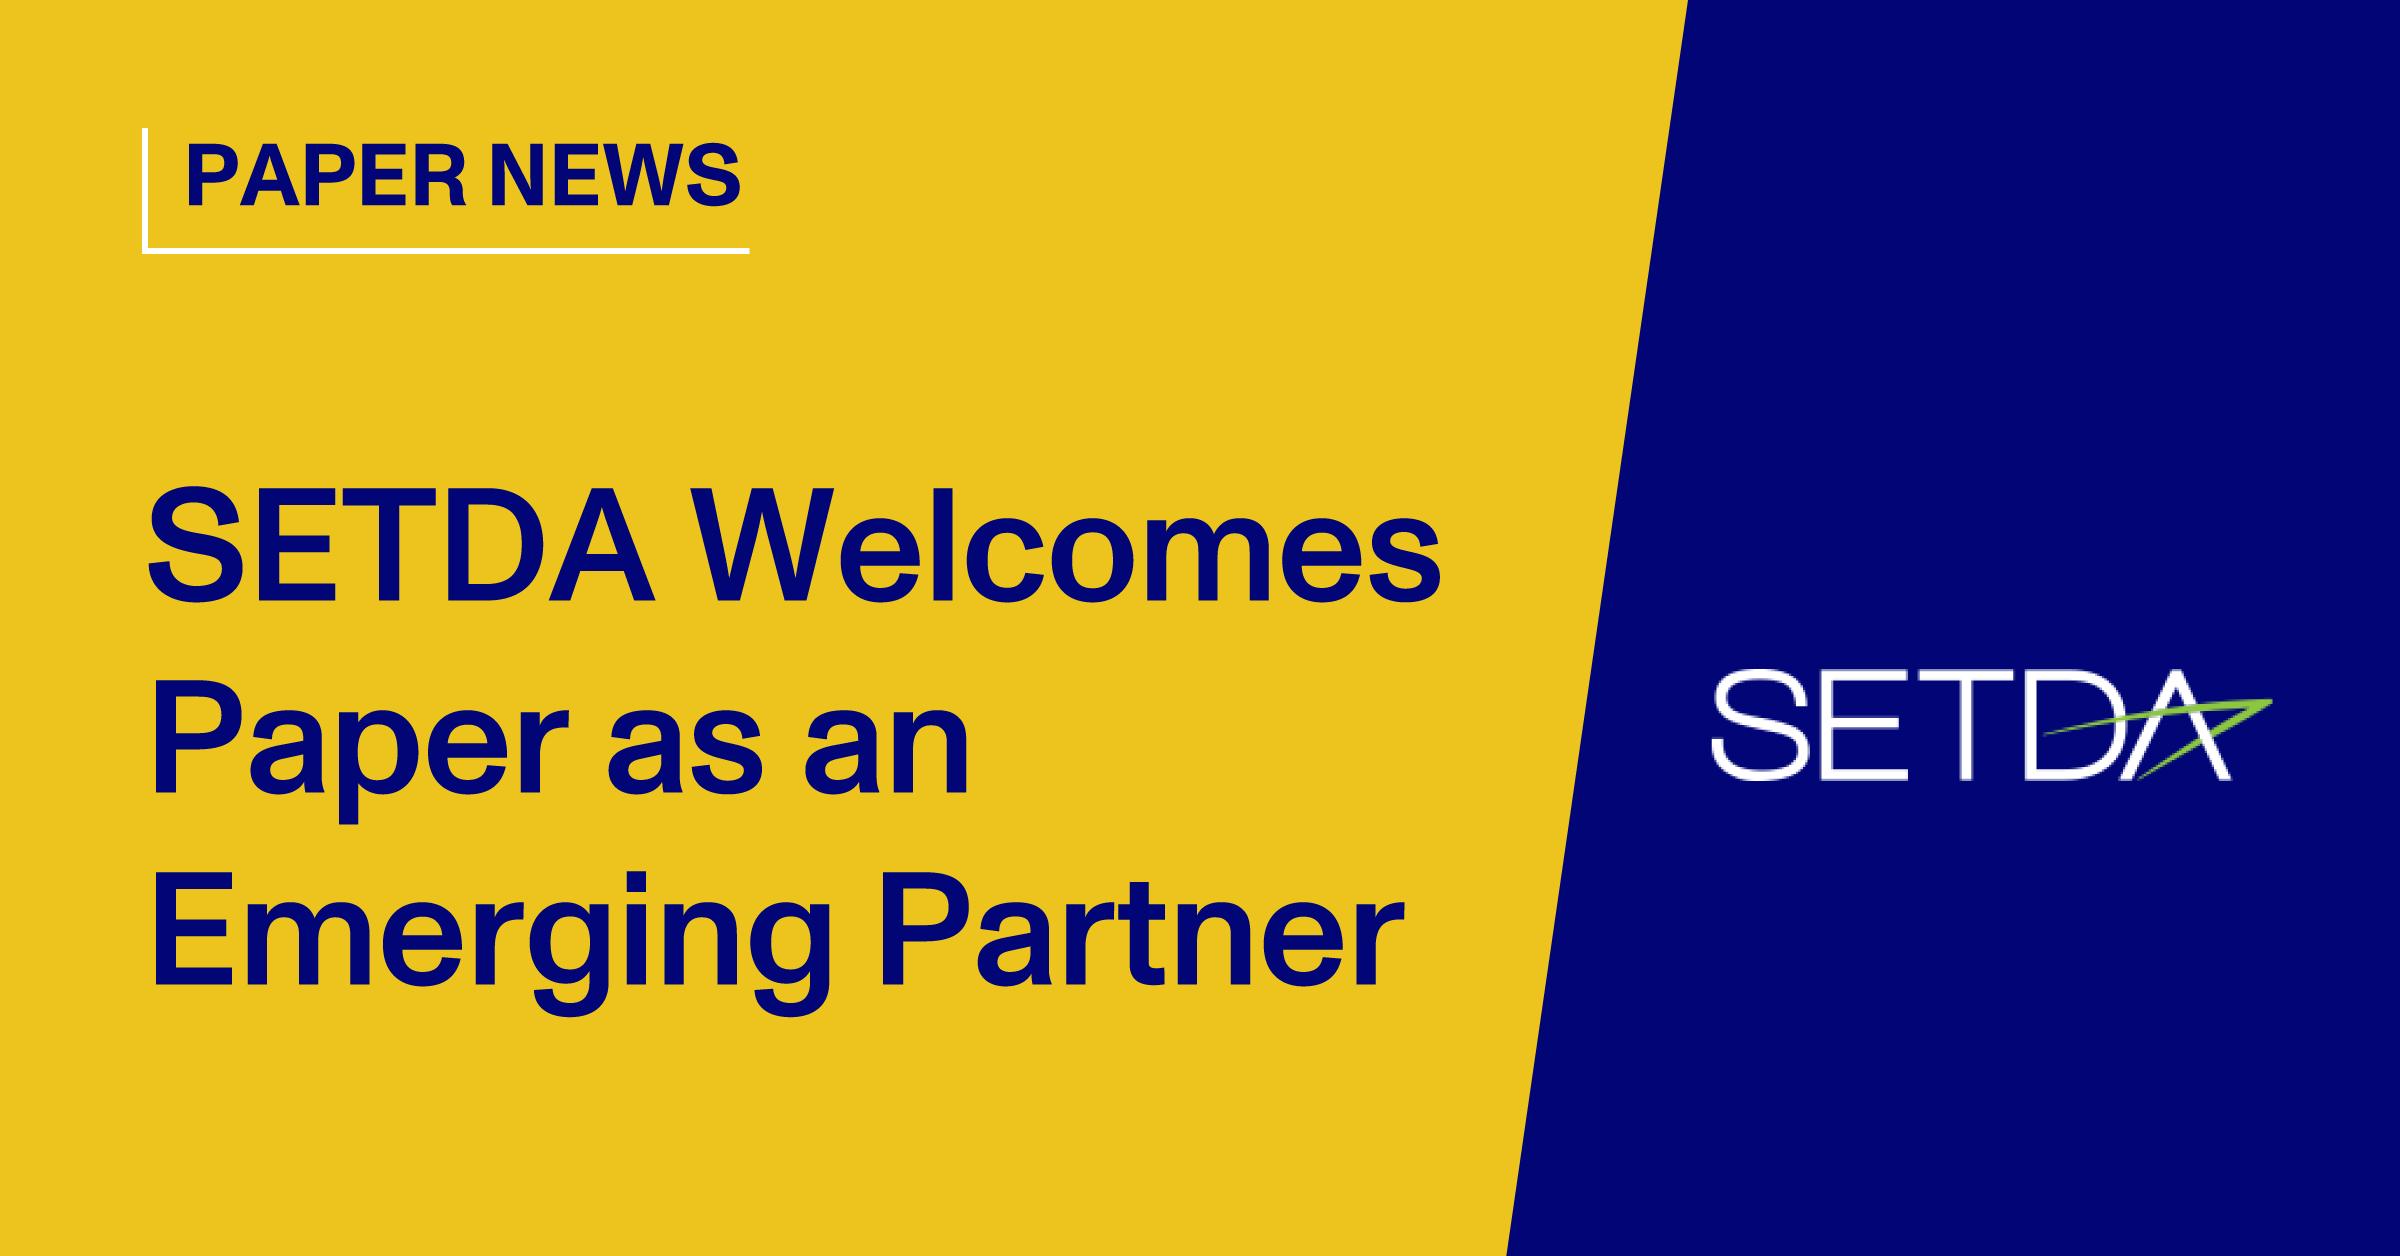 Blog thumbnail with SEDTA logo and headline